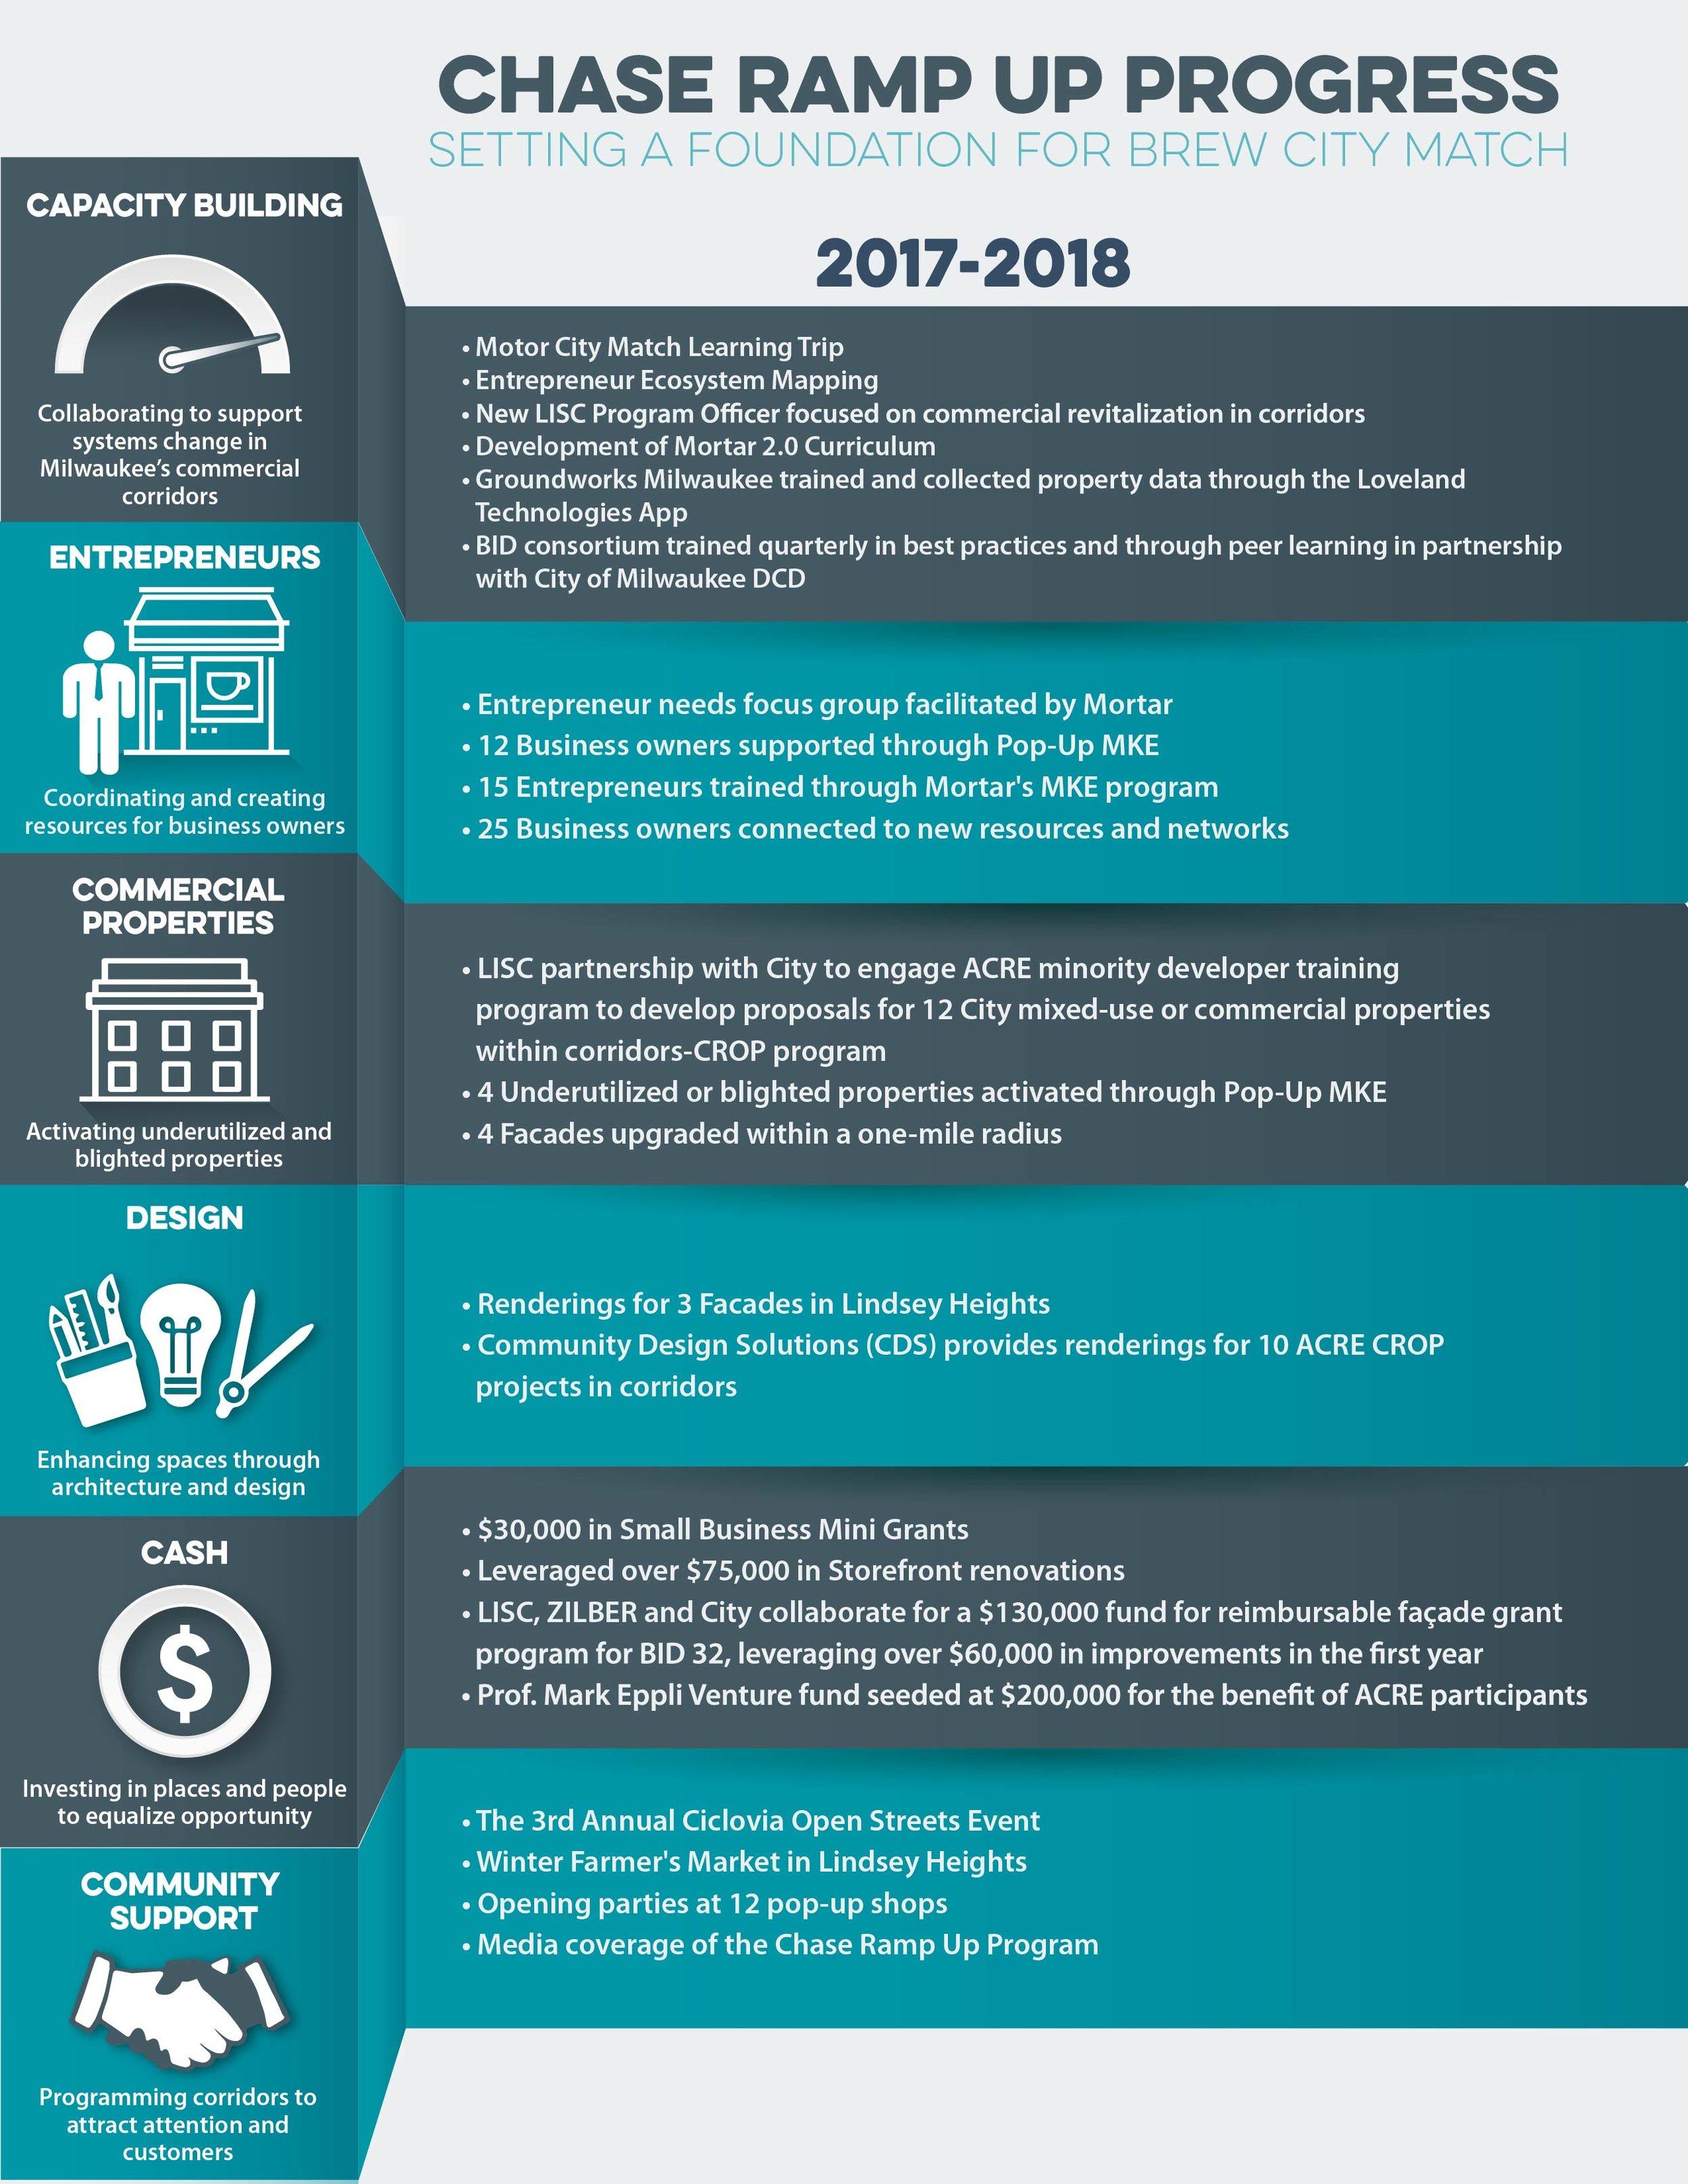 infographic2-01.jpg